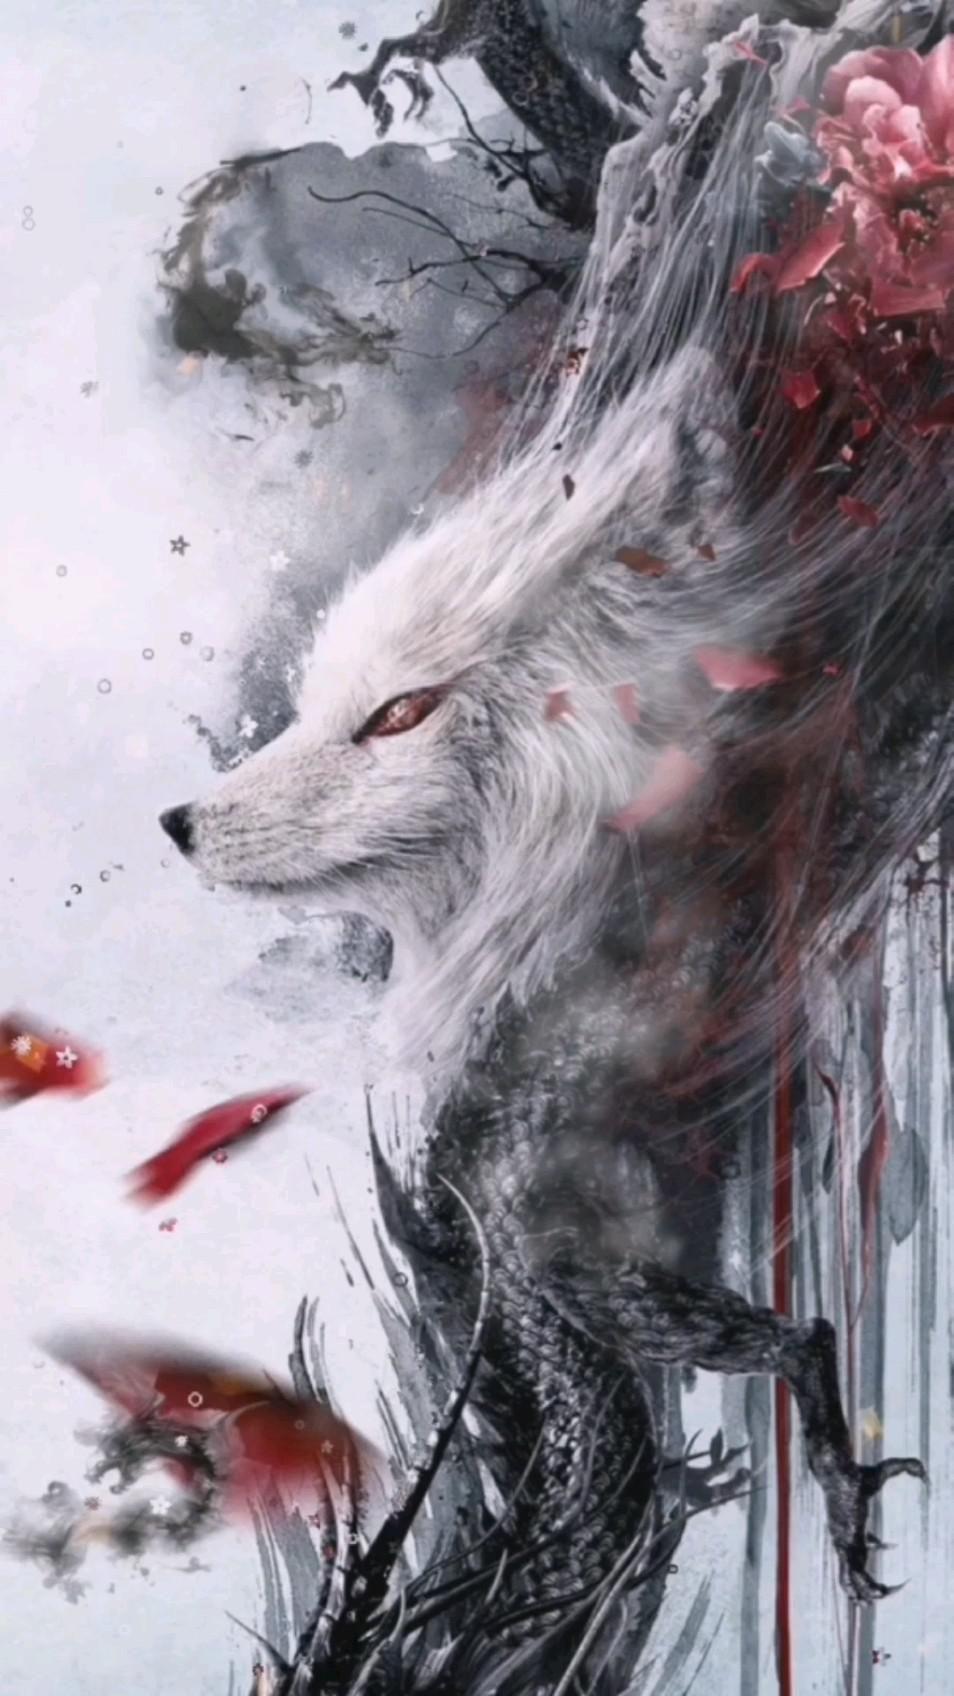 Wolf White #fyp #foryou #videowallpaper #anime #manga #VIDEOGAME #wolf #nature #lobo #animacion